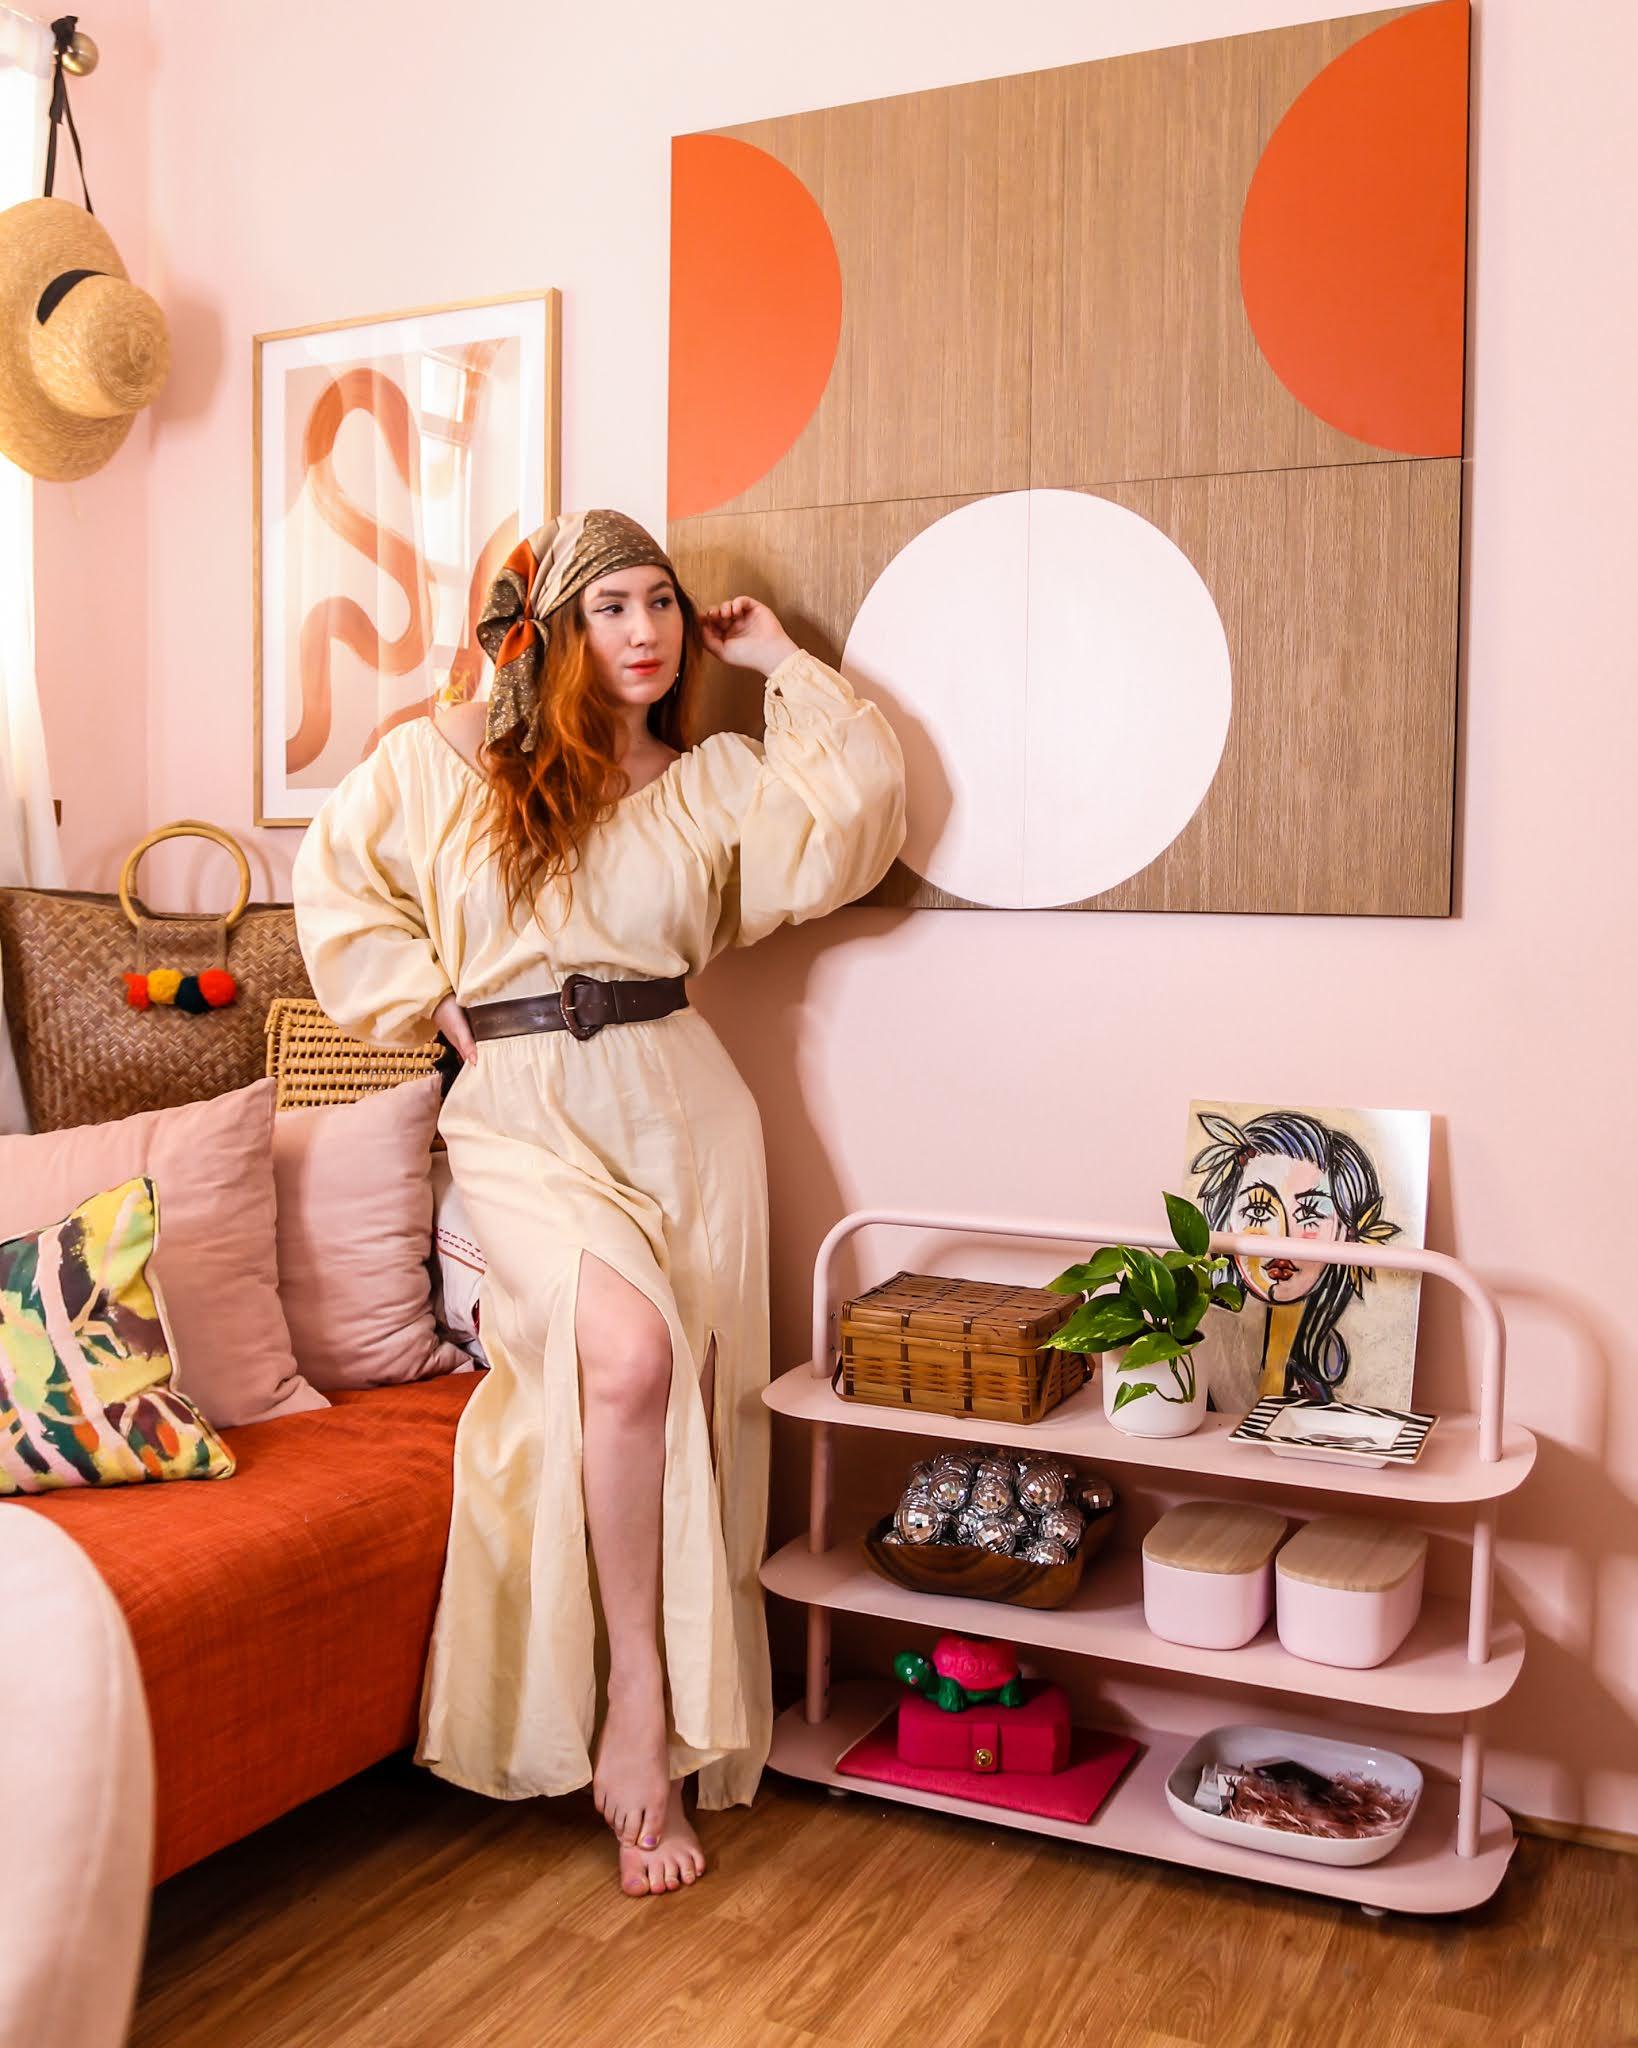 Pink and orange decor // small home office decor // home office ideas // home office Inspo // at home pictures ideas // boho homes // maximalist decor